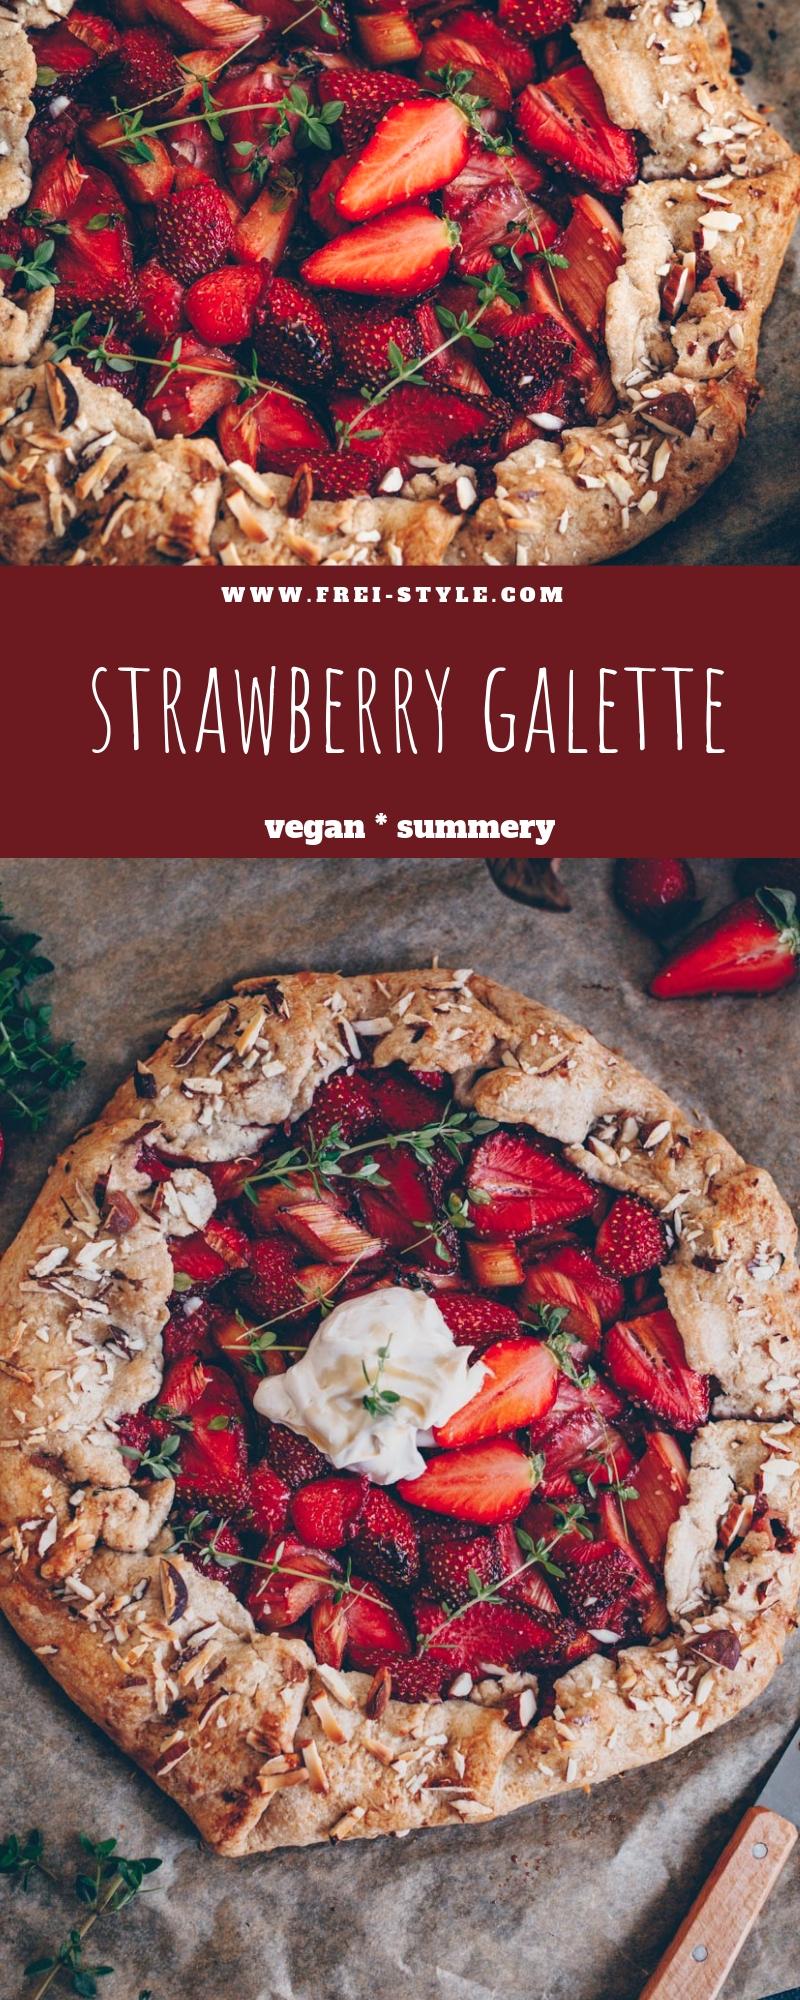 Vegan strawberry Galette